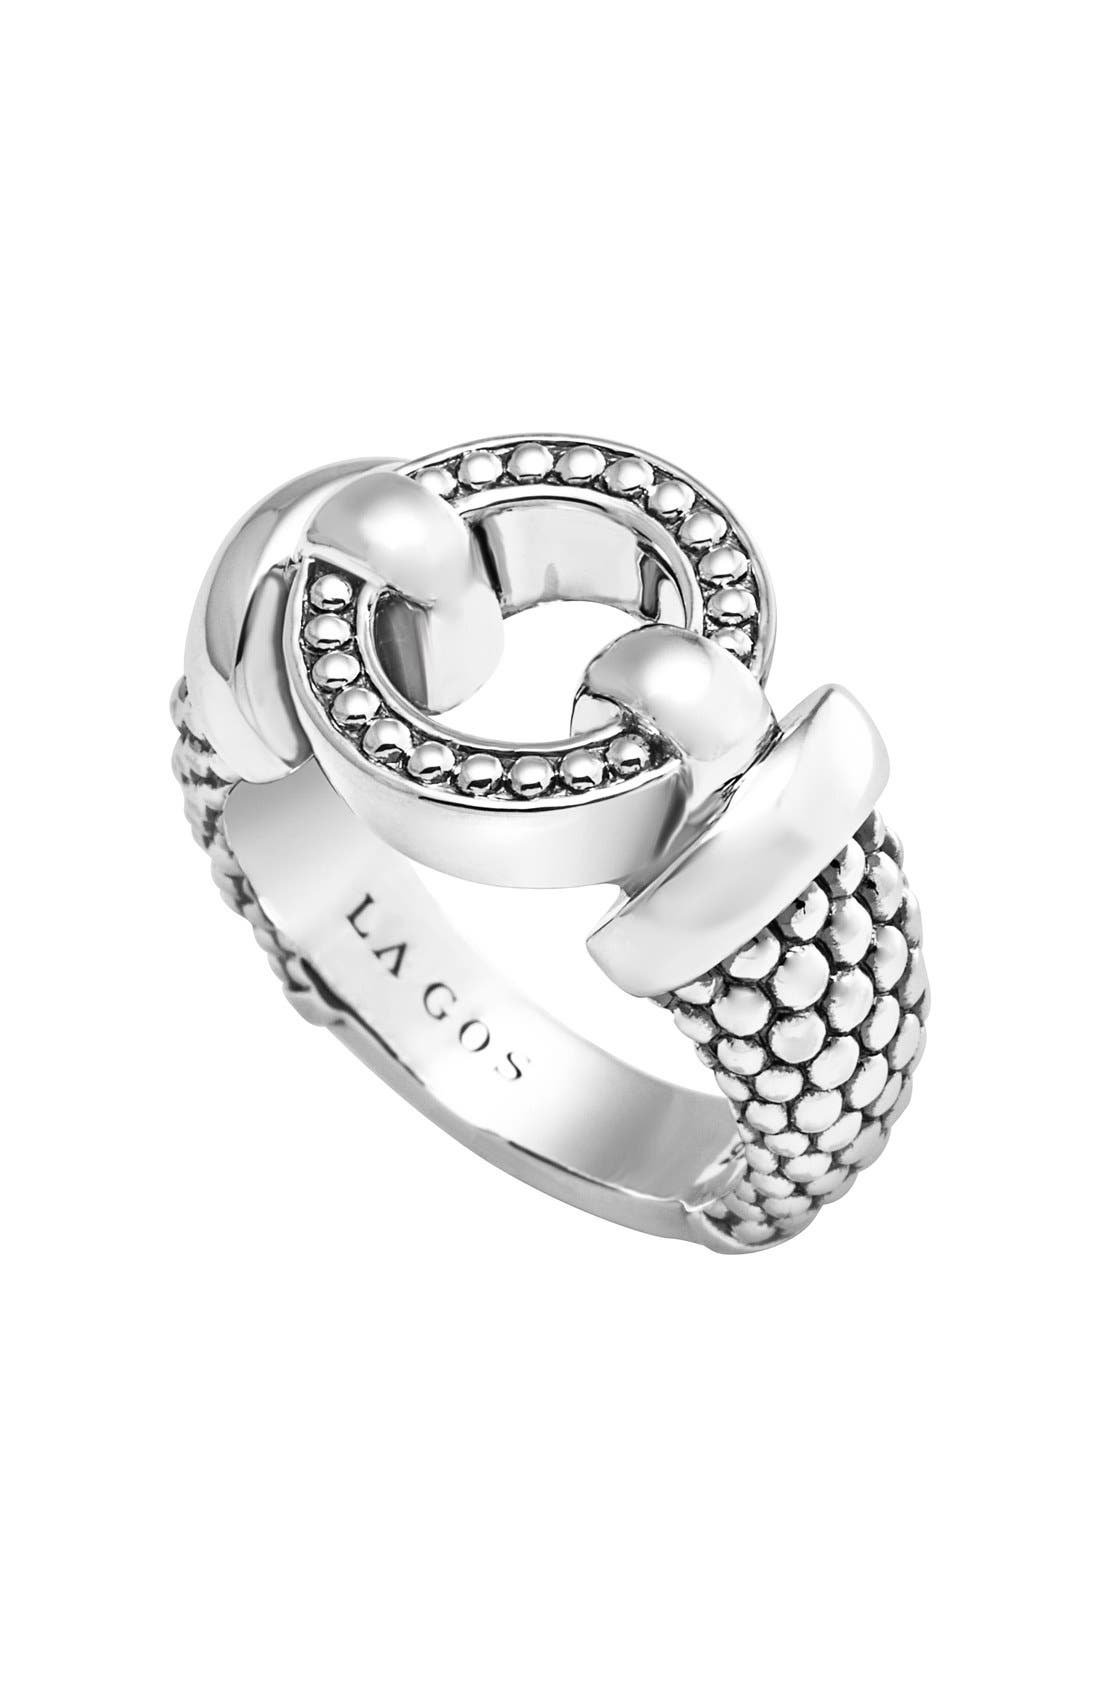 Alternate Image 1 Selected - Lagos 'Enso' Caviar™ Ring